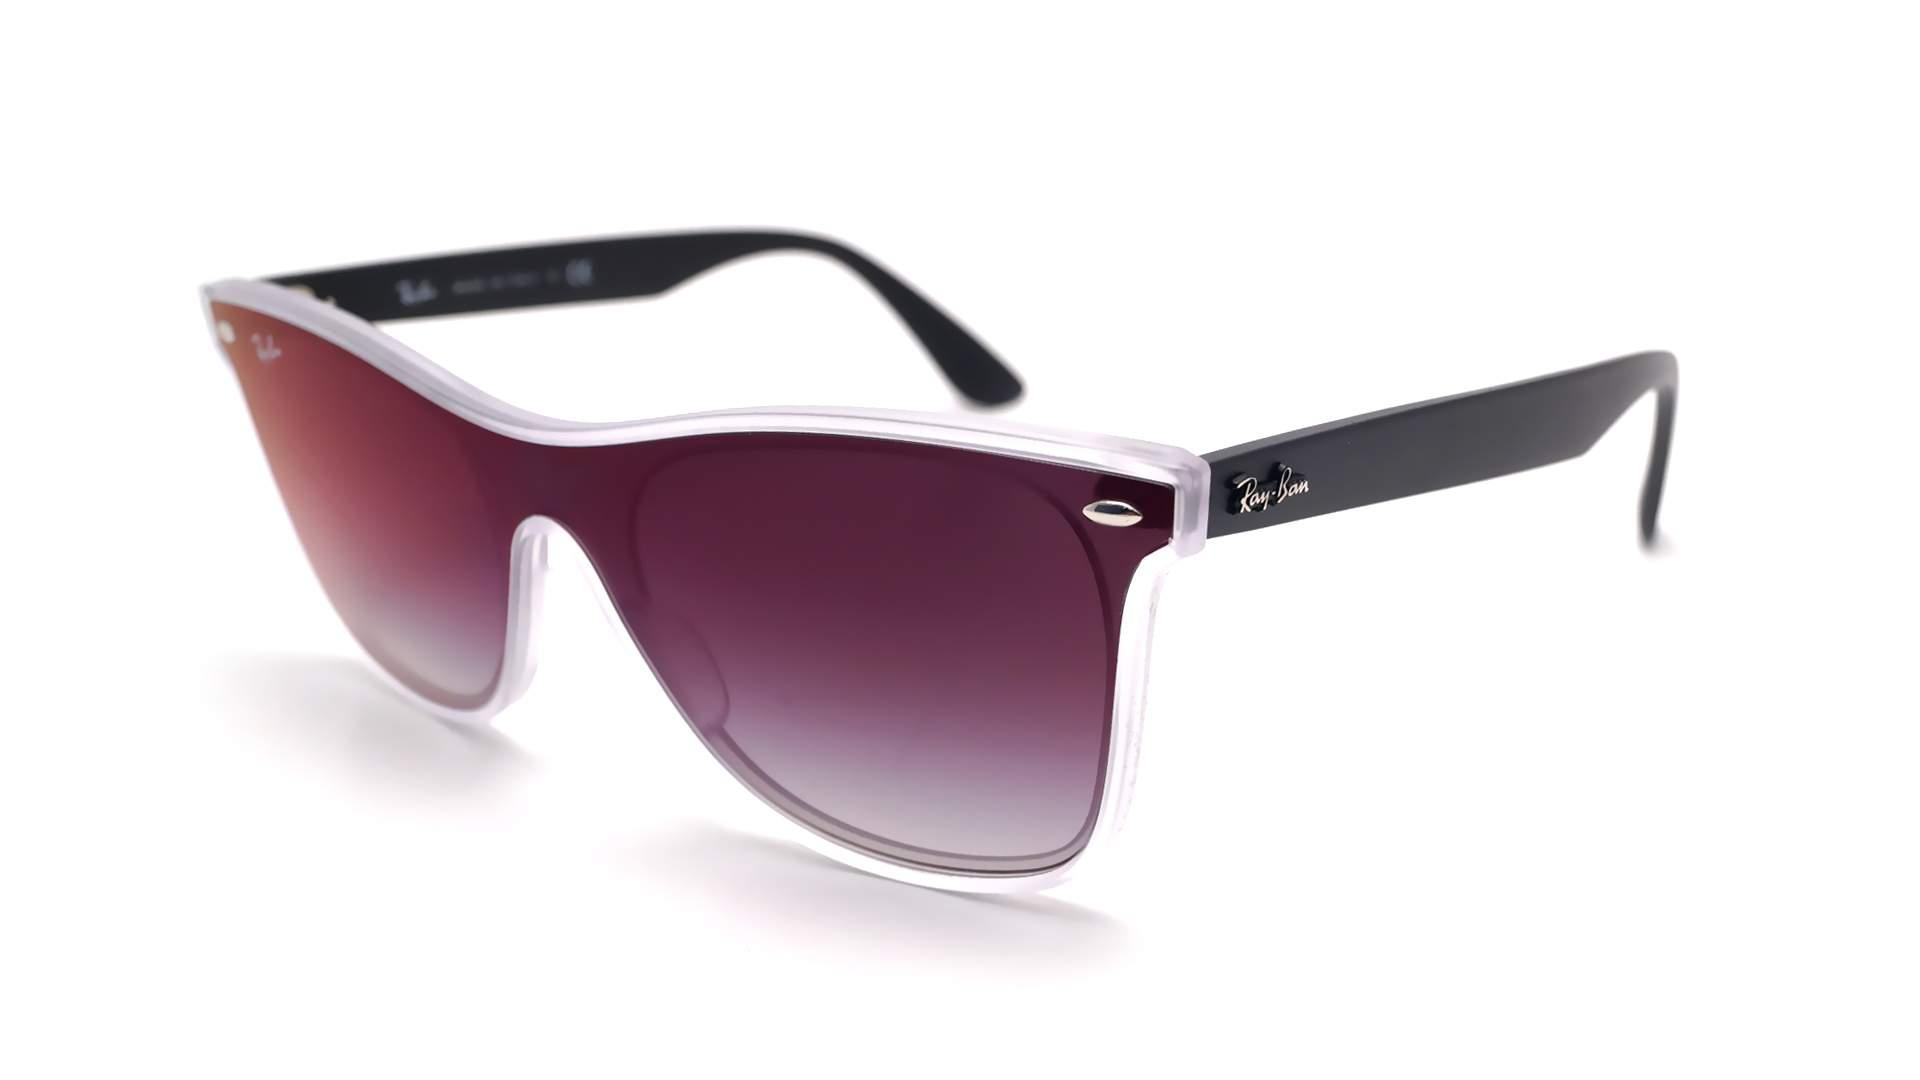 2d3b394217 Sunglasses Ray-Ban Wayfarer Blaze Black RB4440N 6355 U0 41-18 Medium  Gradient Mirror